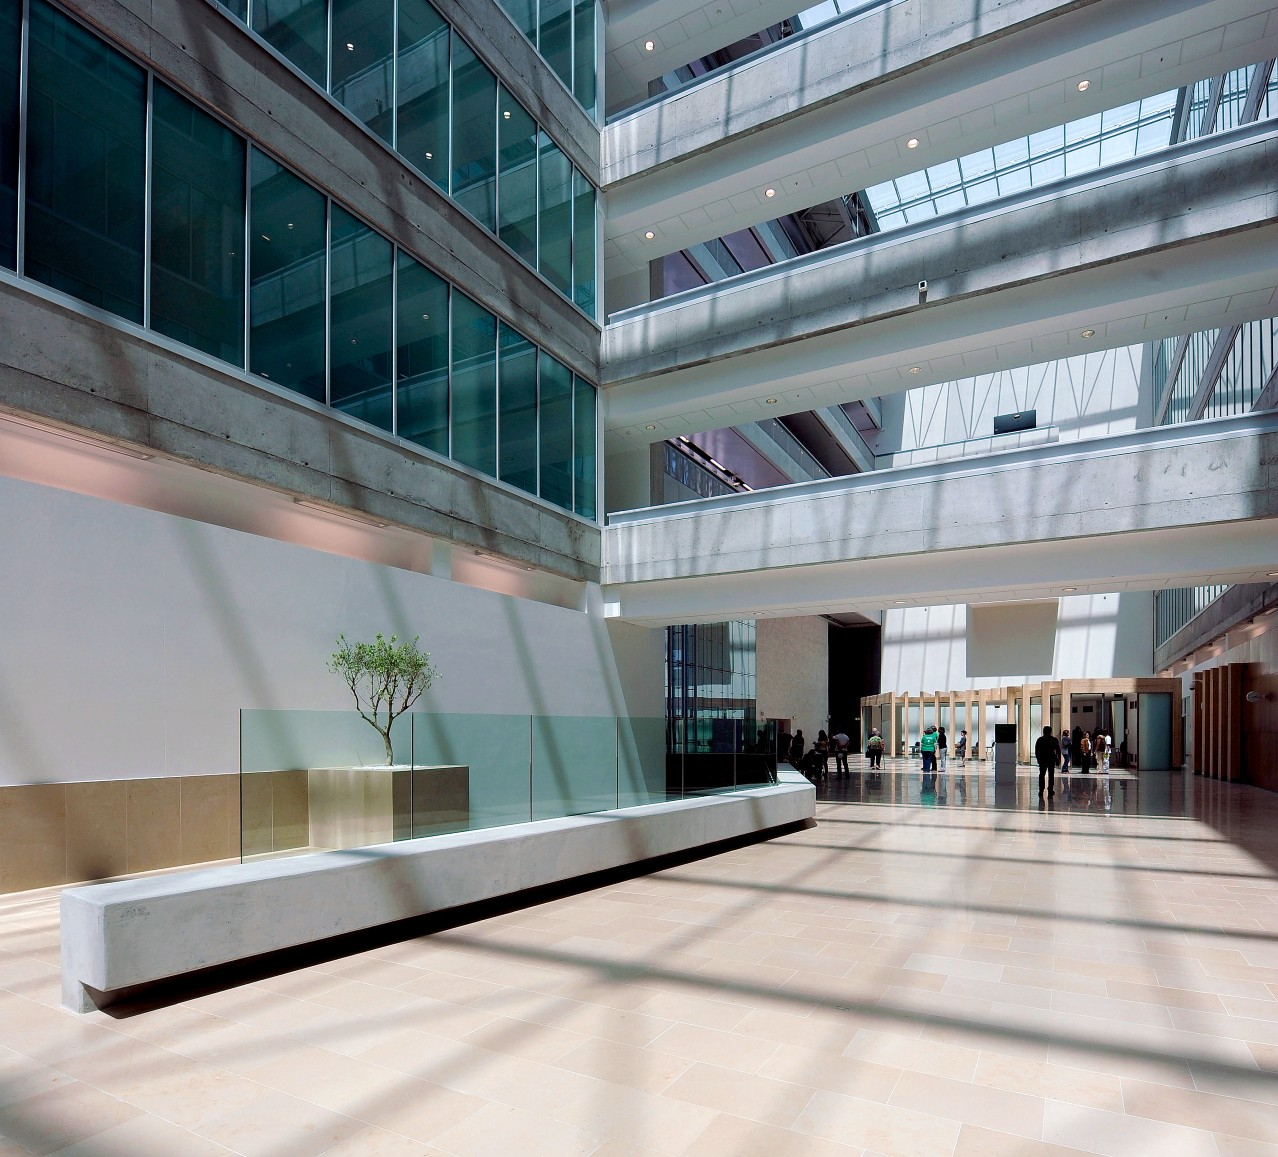 hospital-de-braga-Superamos metas na atividade assistencial contratualizada